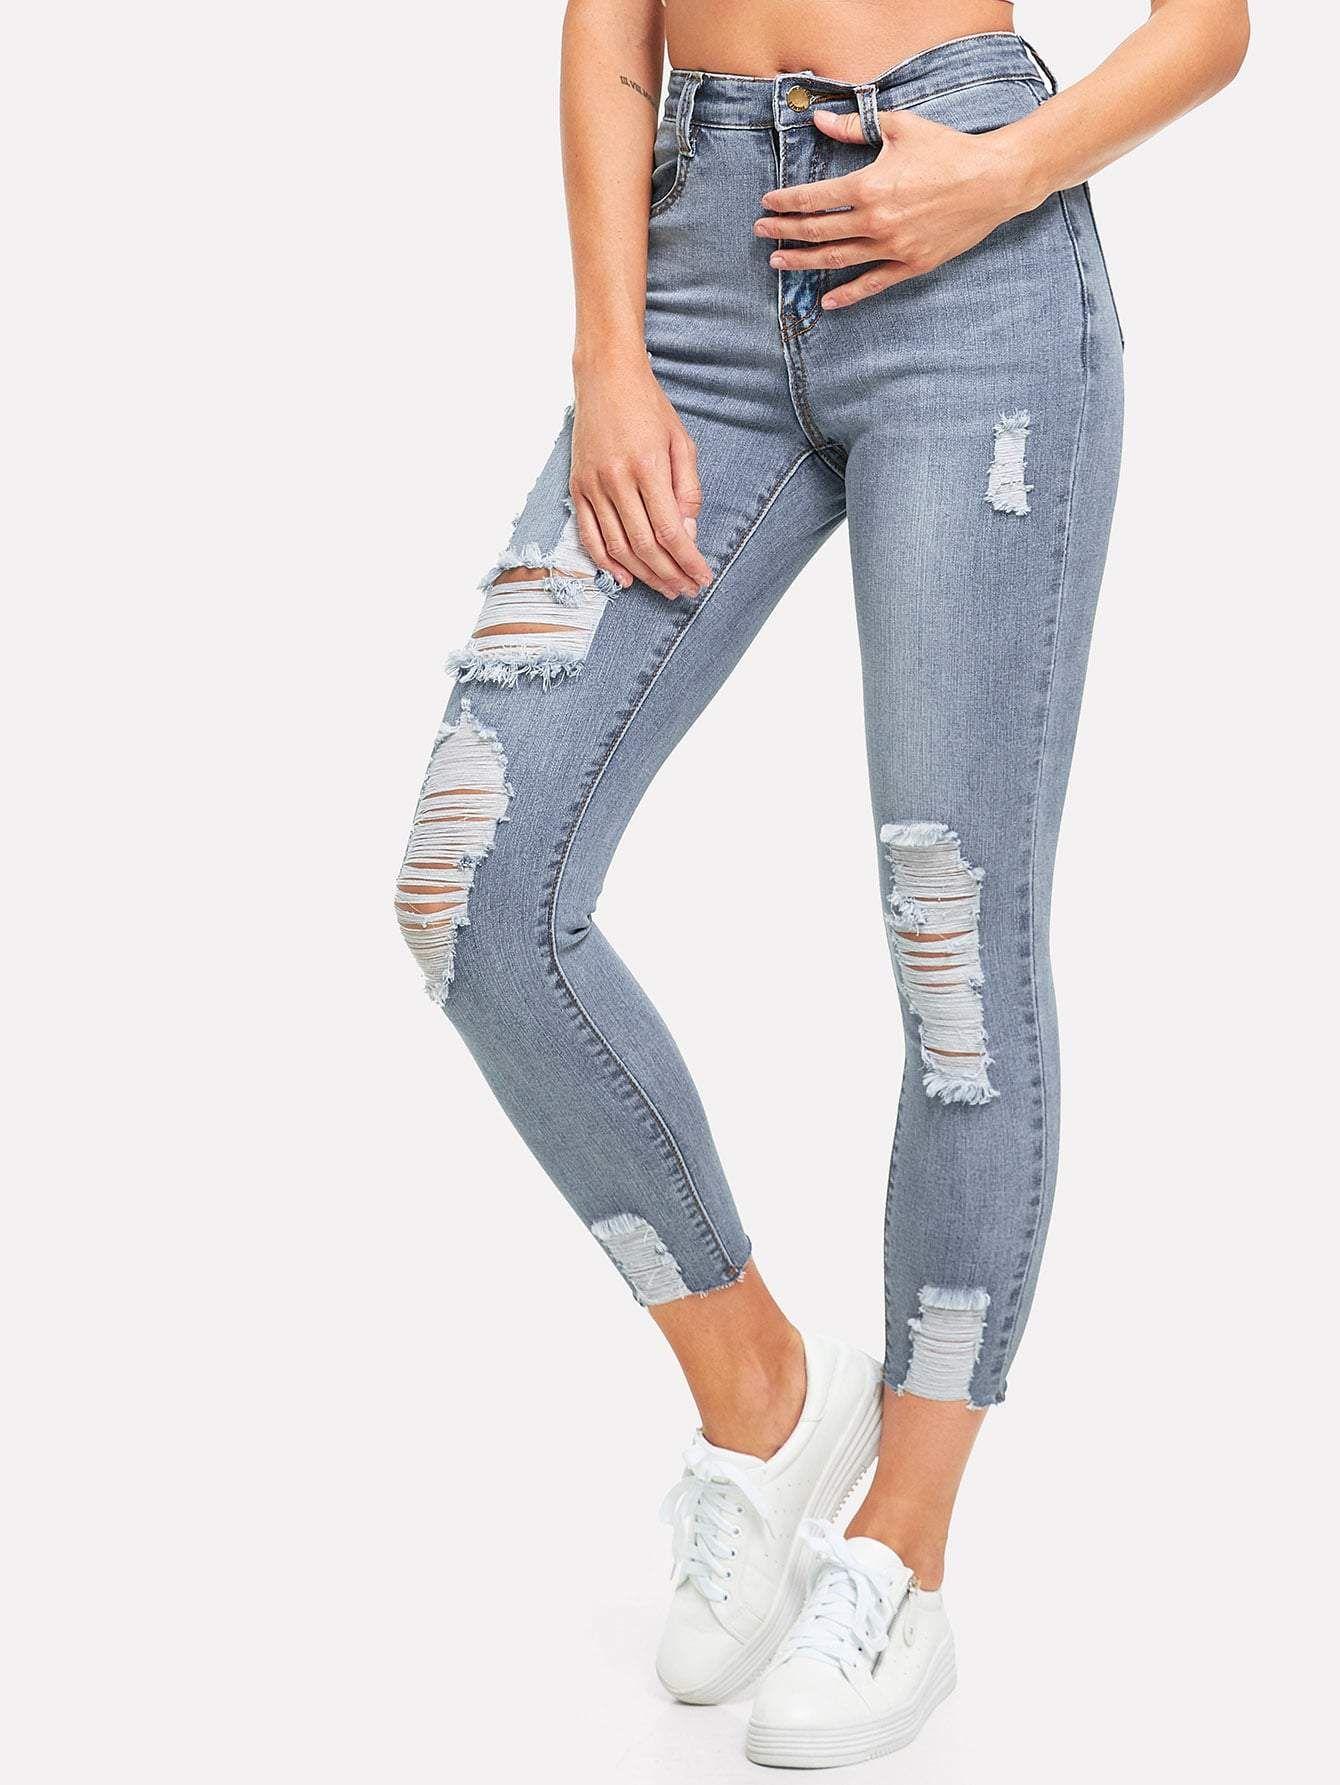 Ripped Bleach Wash Skinny Jeans Jeans Denim Women Fashion Washed Jeans Cute Ripped Jeans Women Jeans